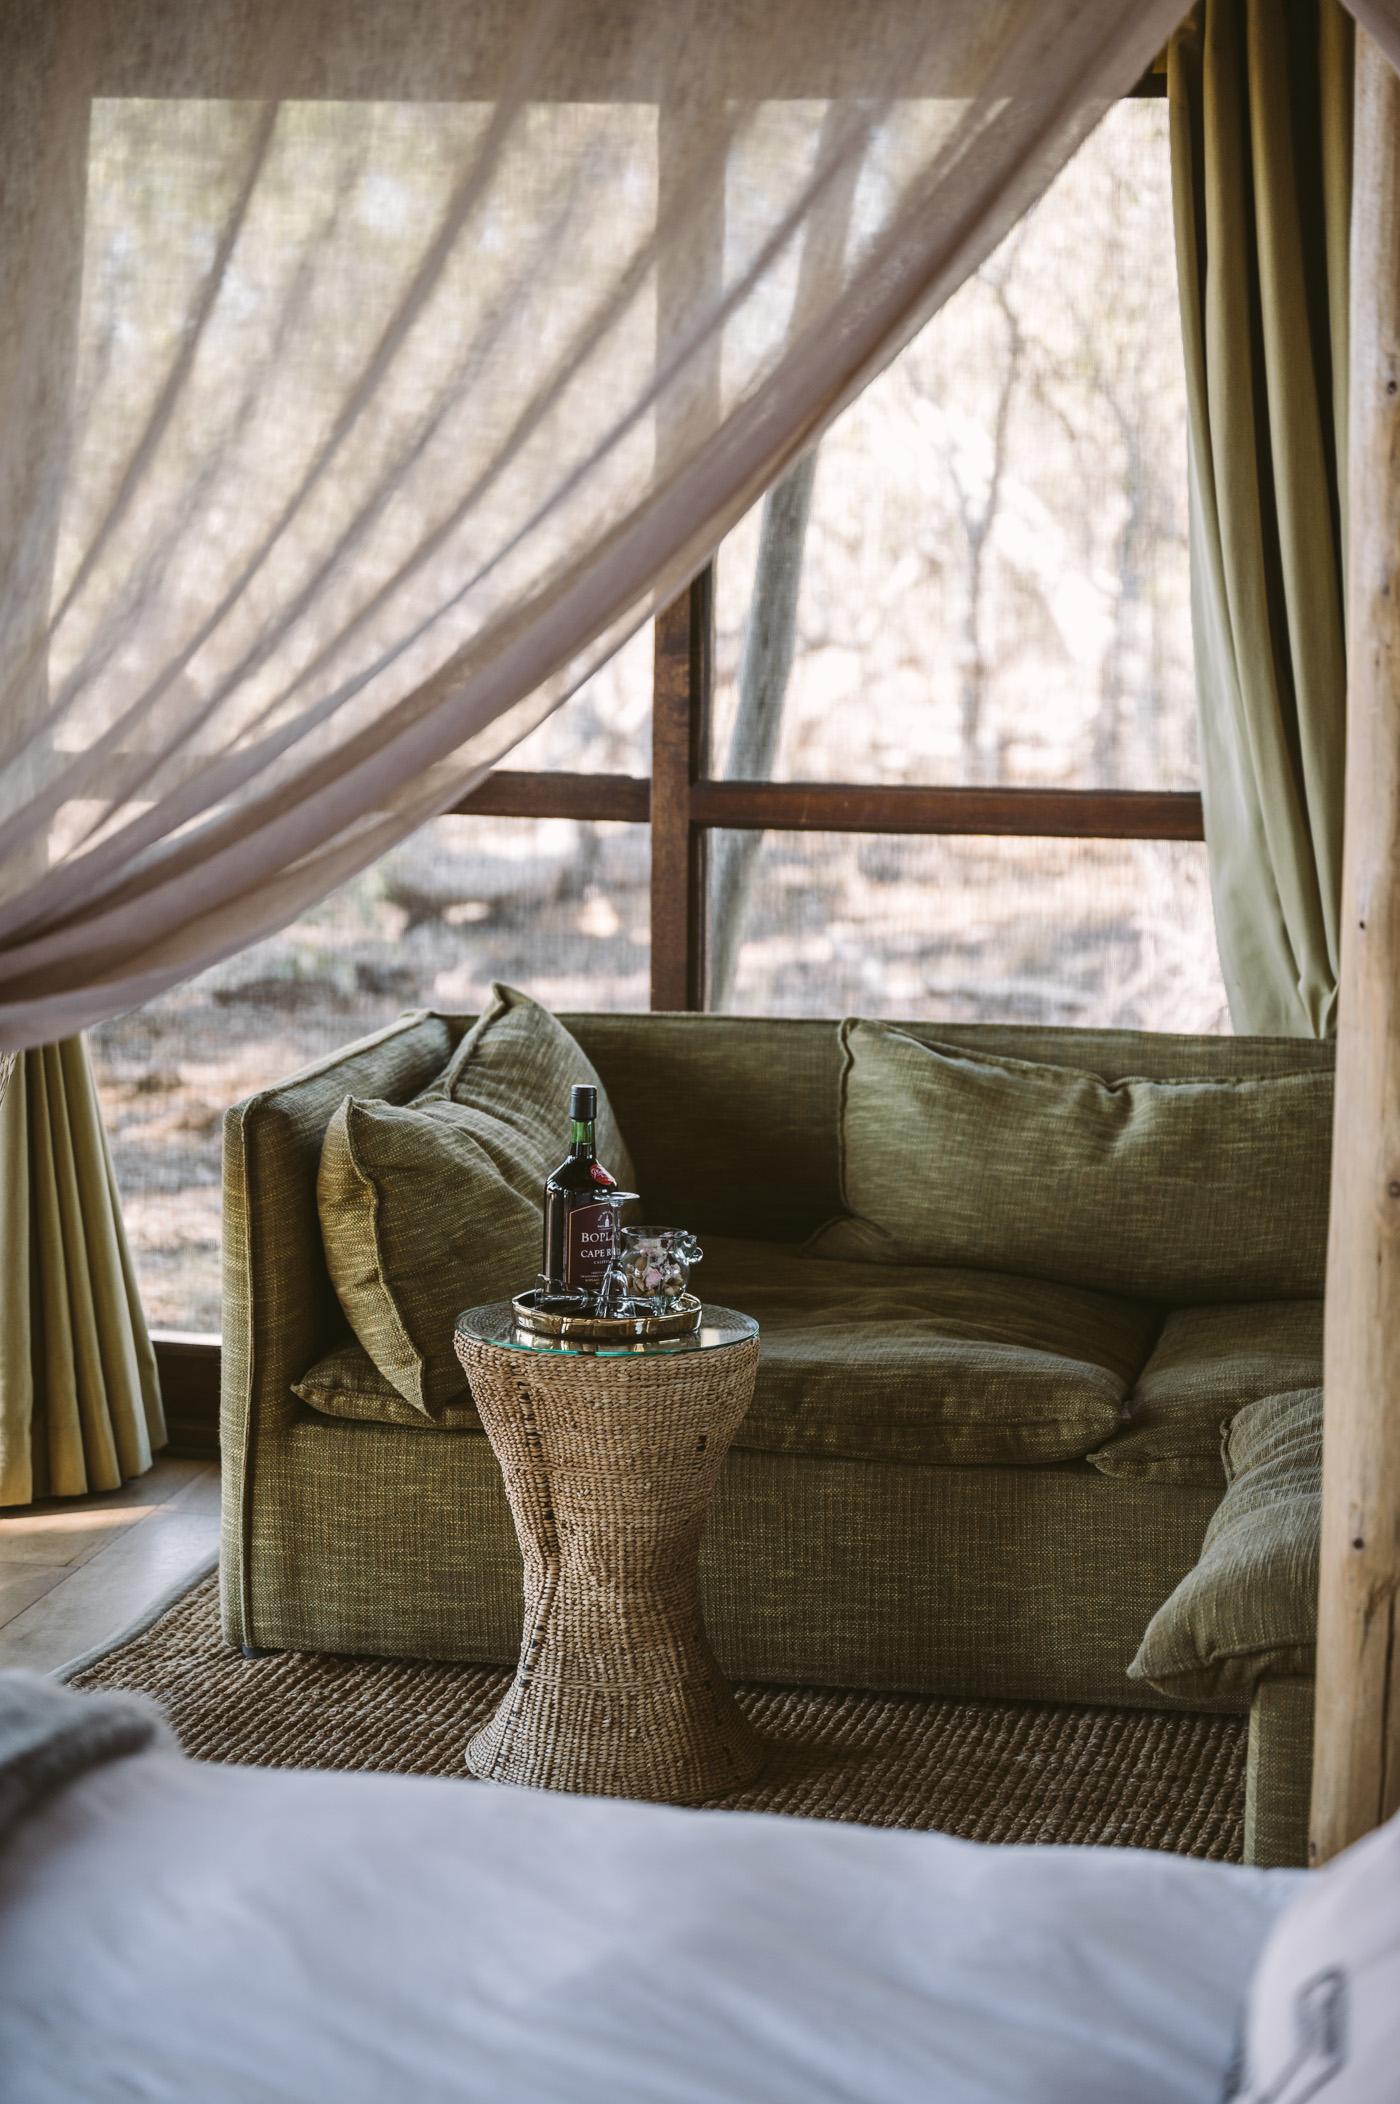 andBeyond Xaranna Okavango Delta Camp couch